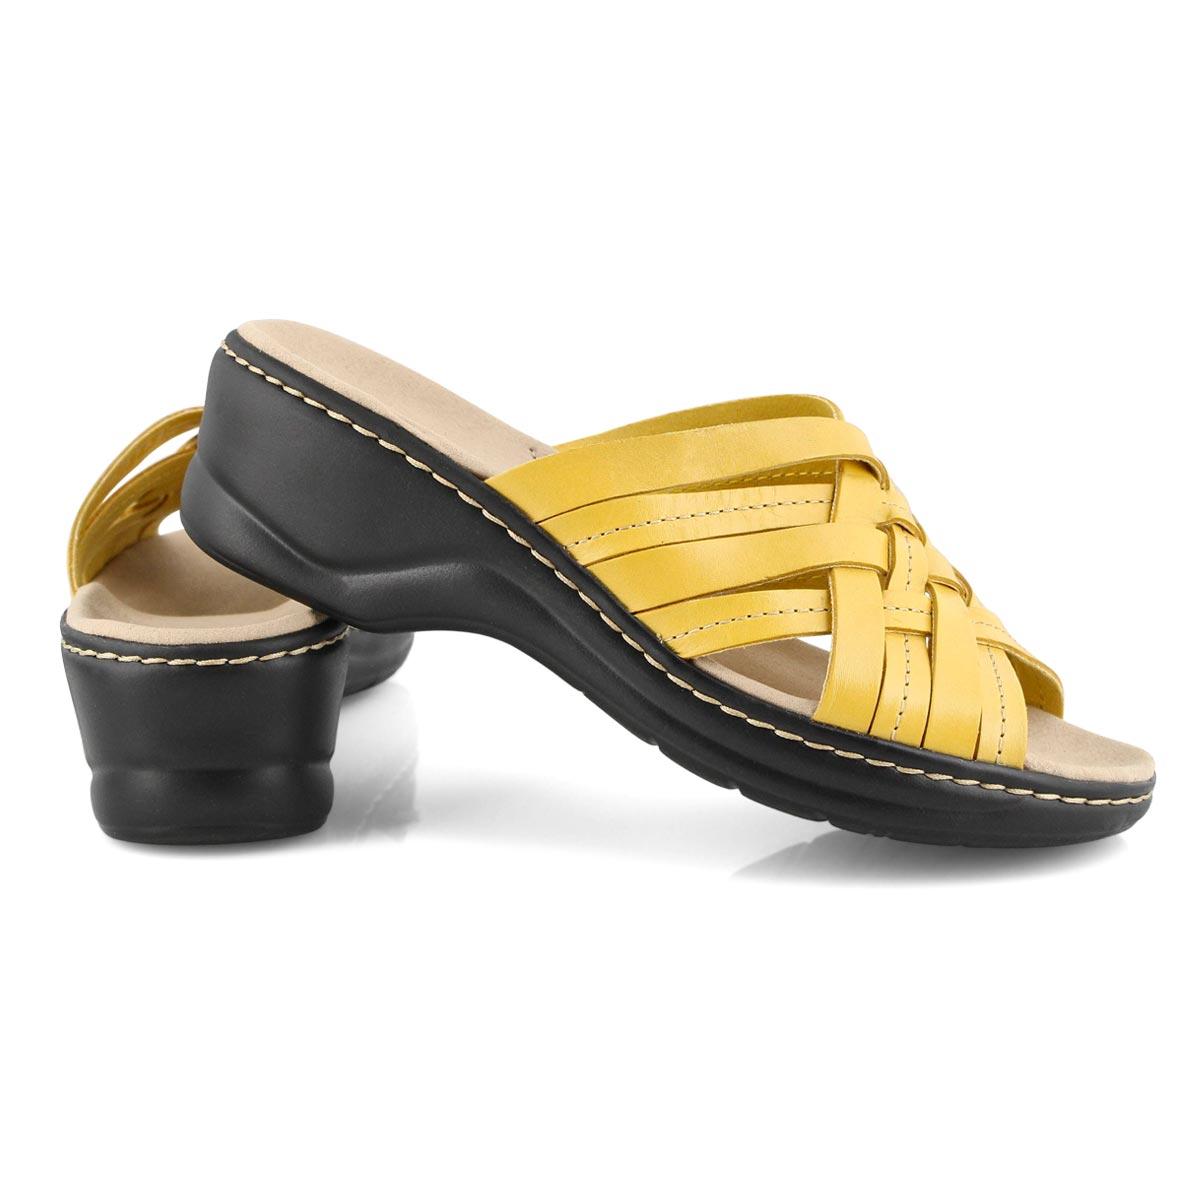 Lds Lexi Salina yellow slides -wide